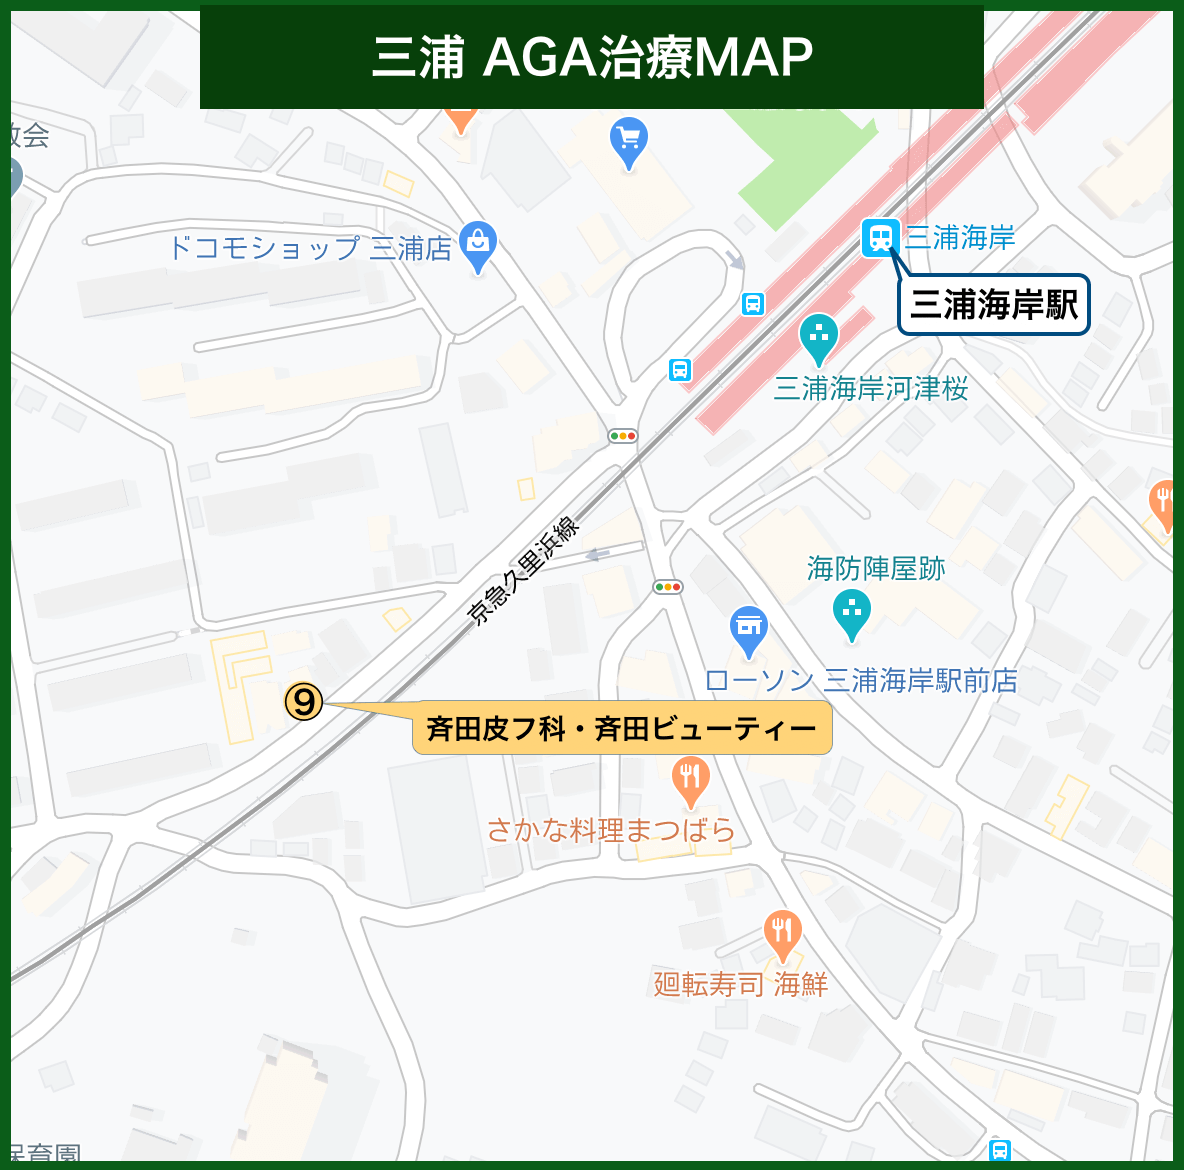 三浦 AGA治療MAP